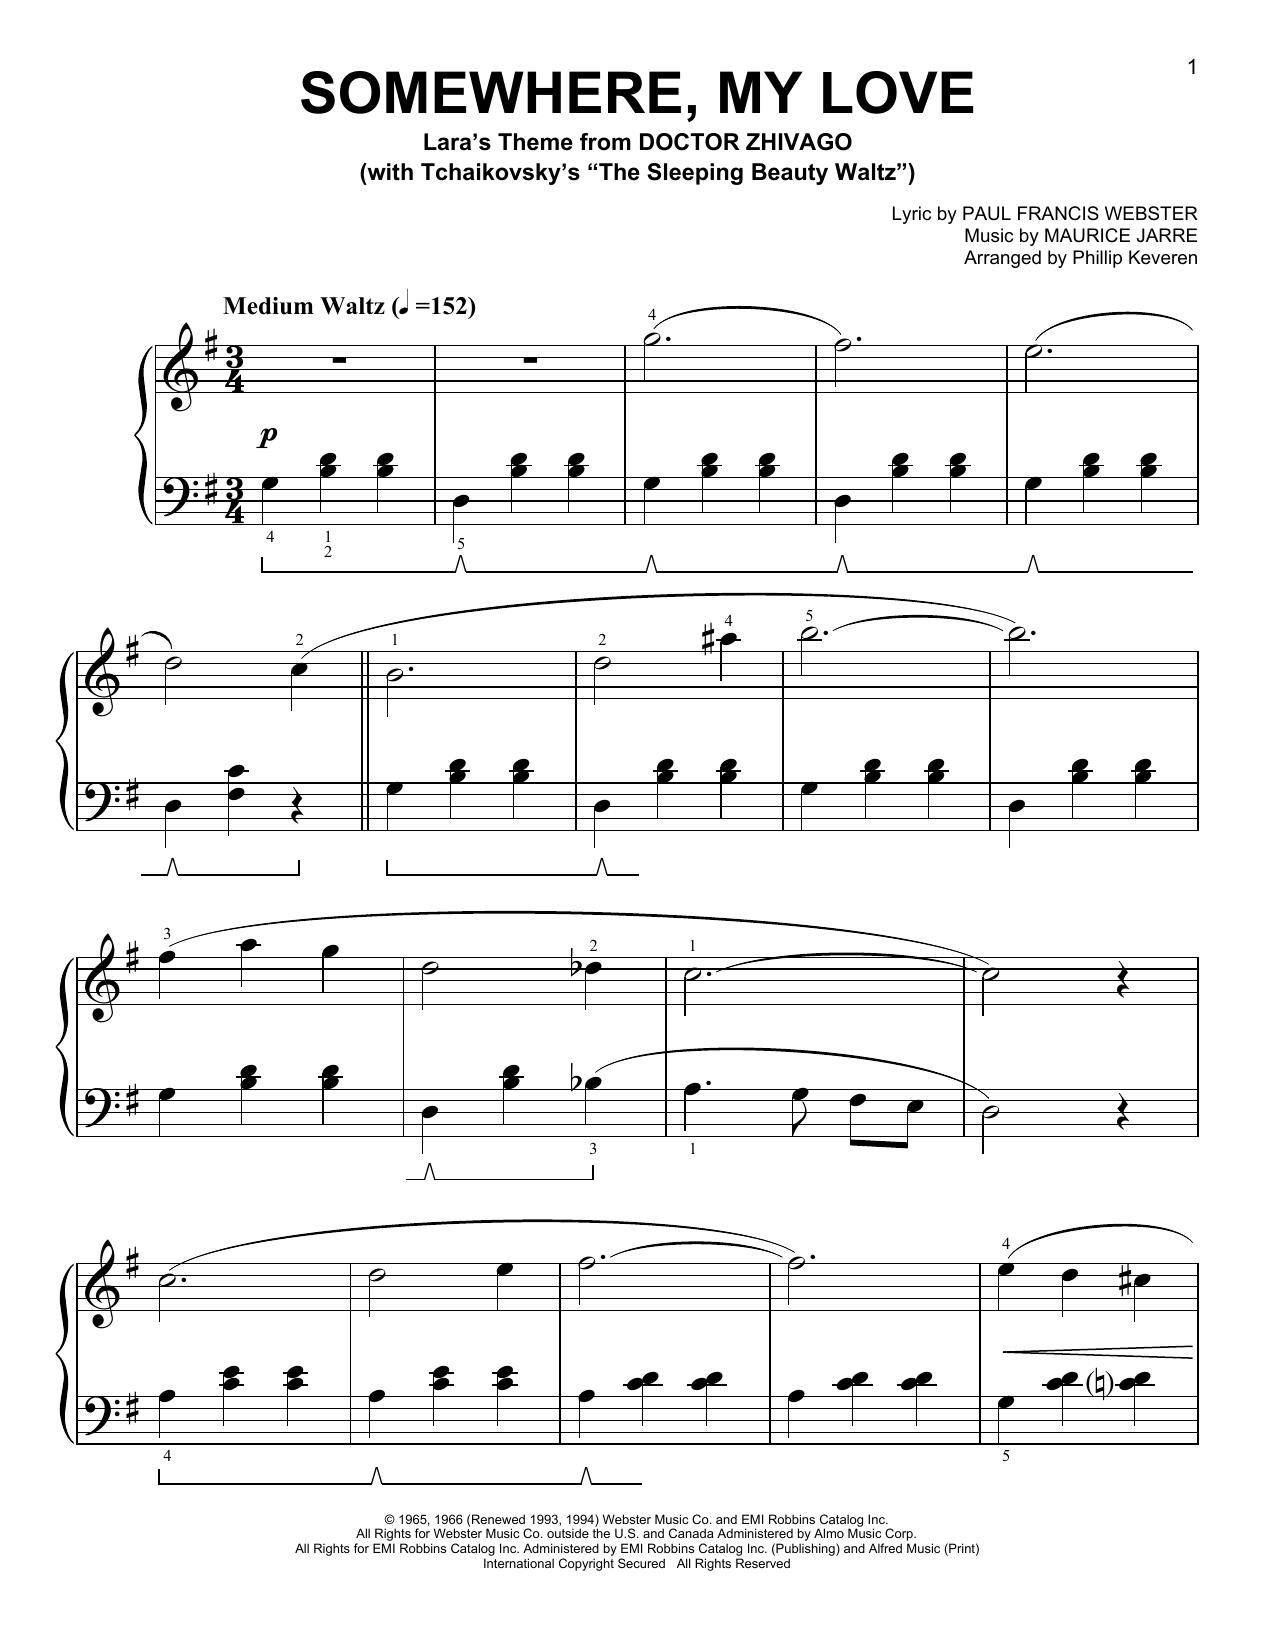 Sheet music digital files to print licensed paul francis webster somewhere my love stopboris Choice Image